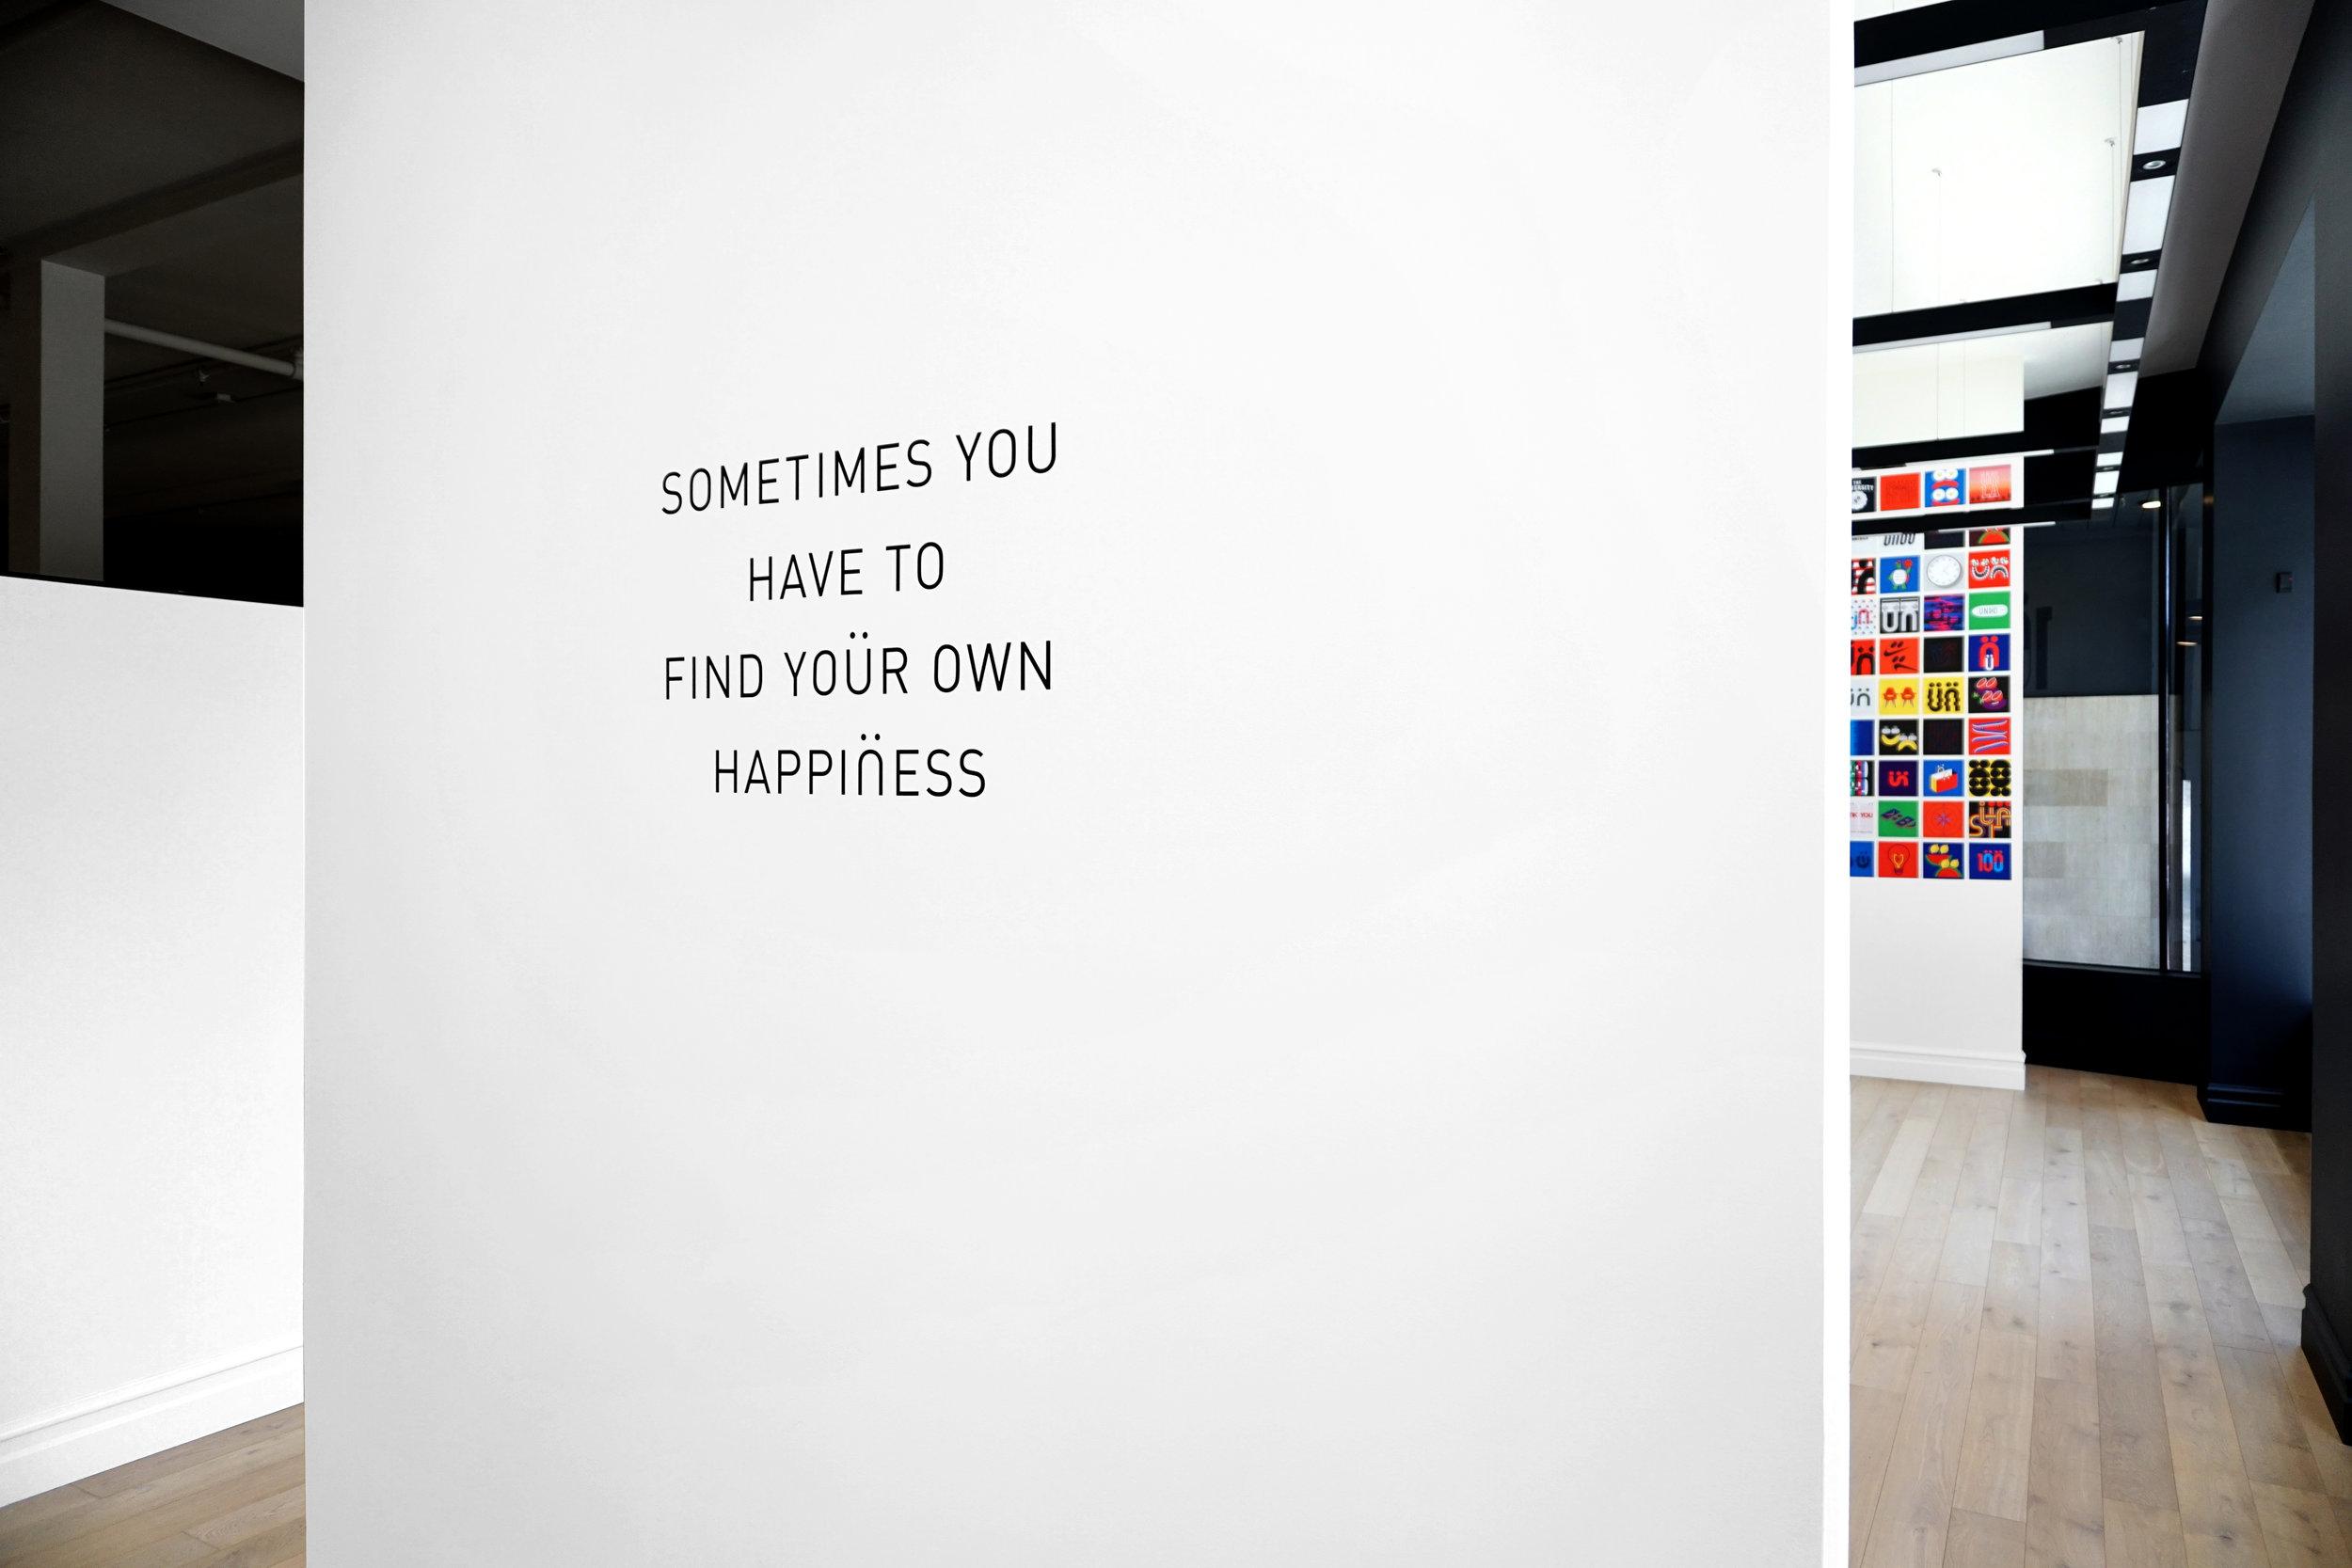 100 Happiness_6.jpg